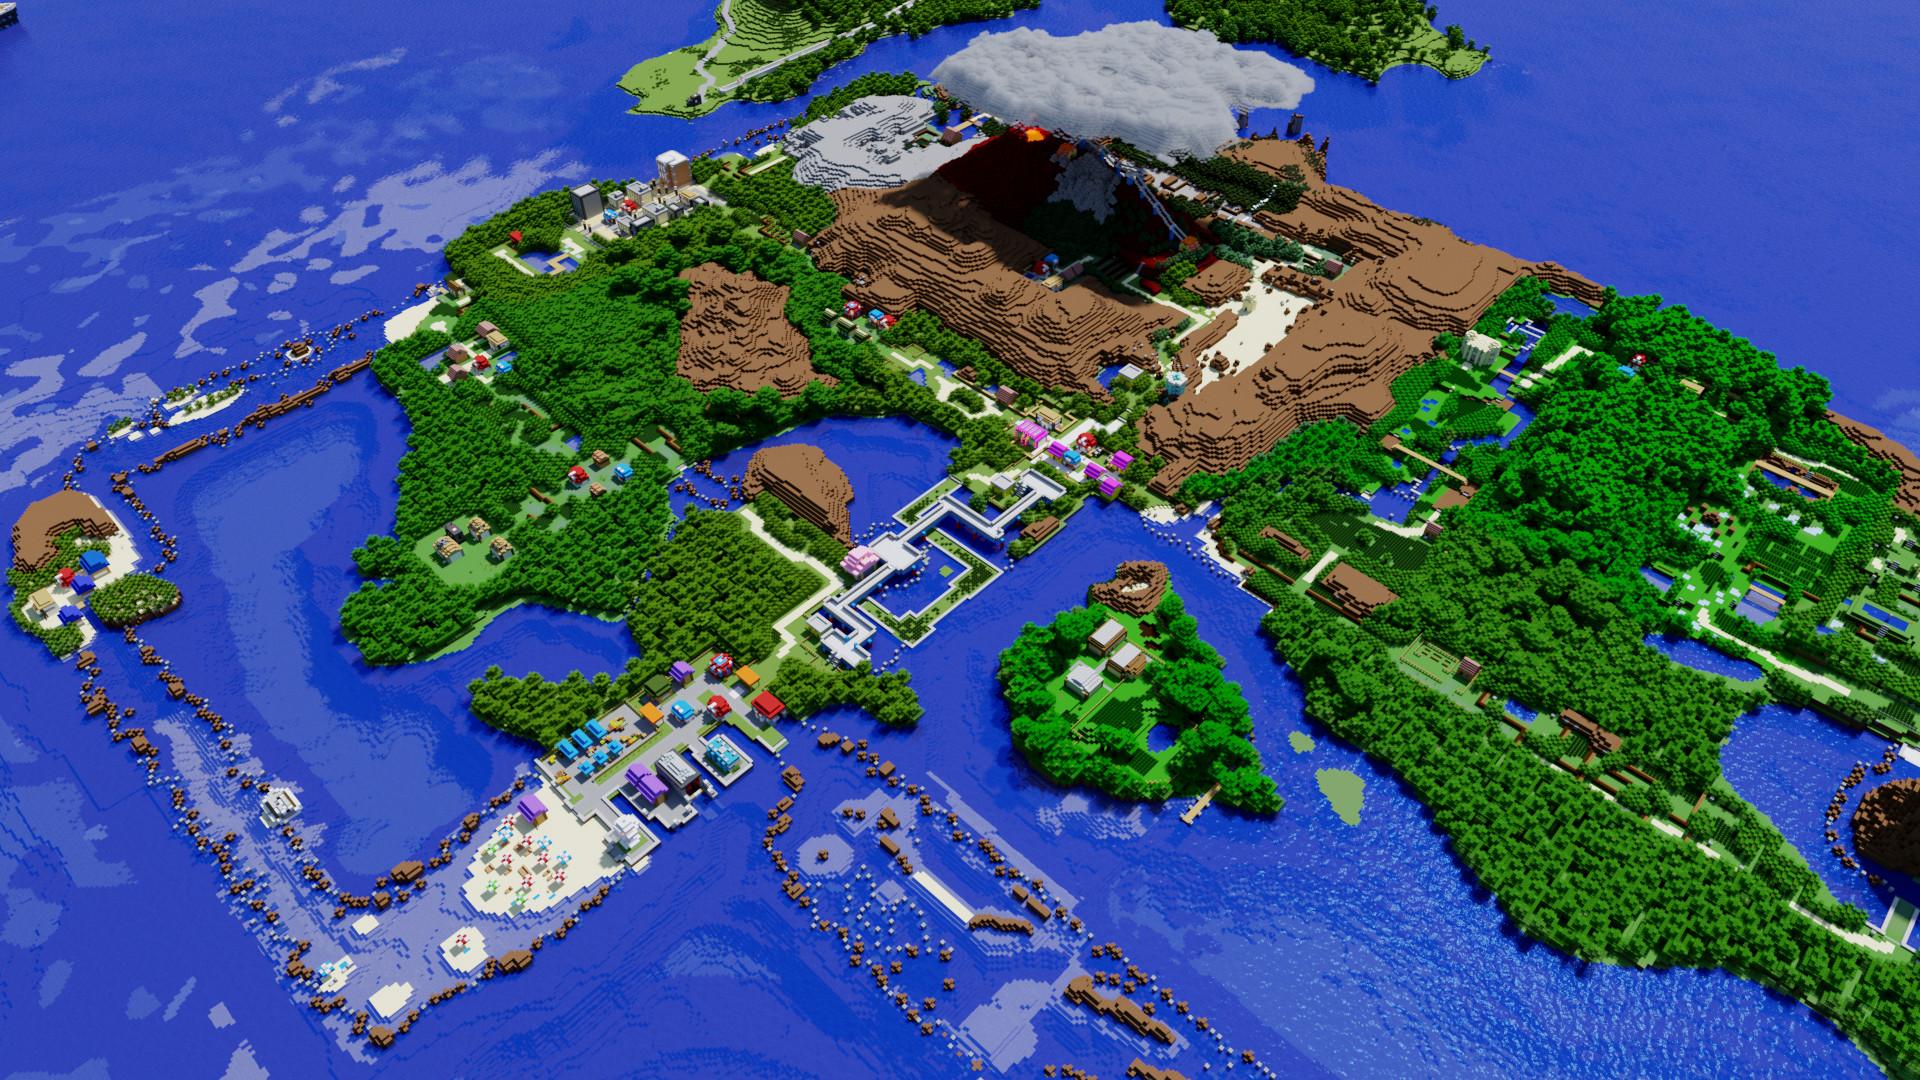 Minecraft Pokemon Hoenn Region Wallpaper